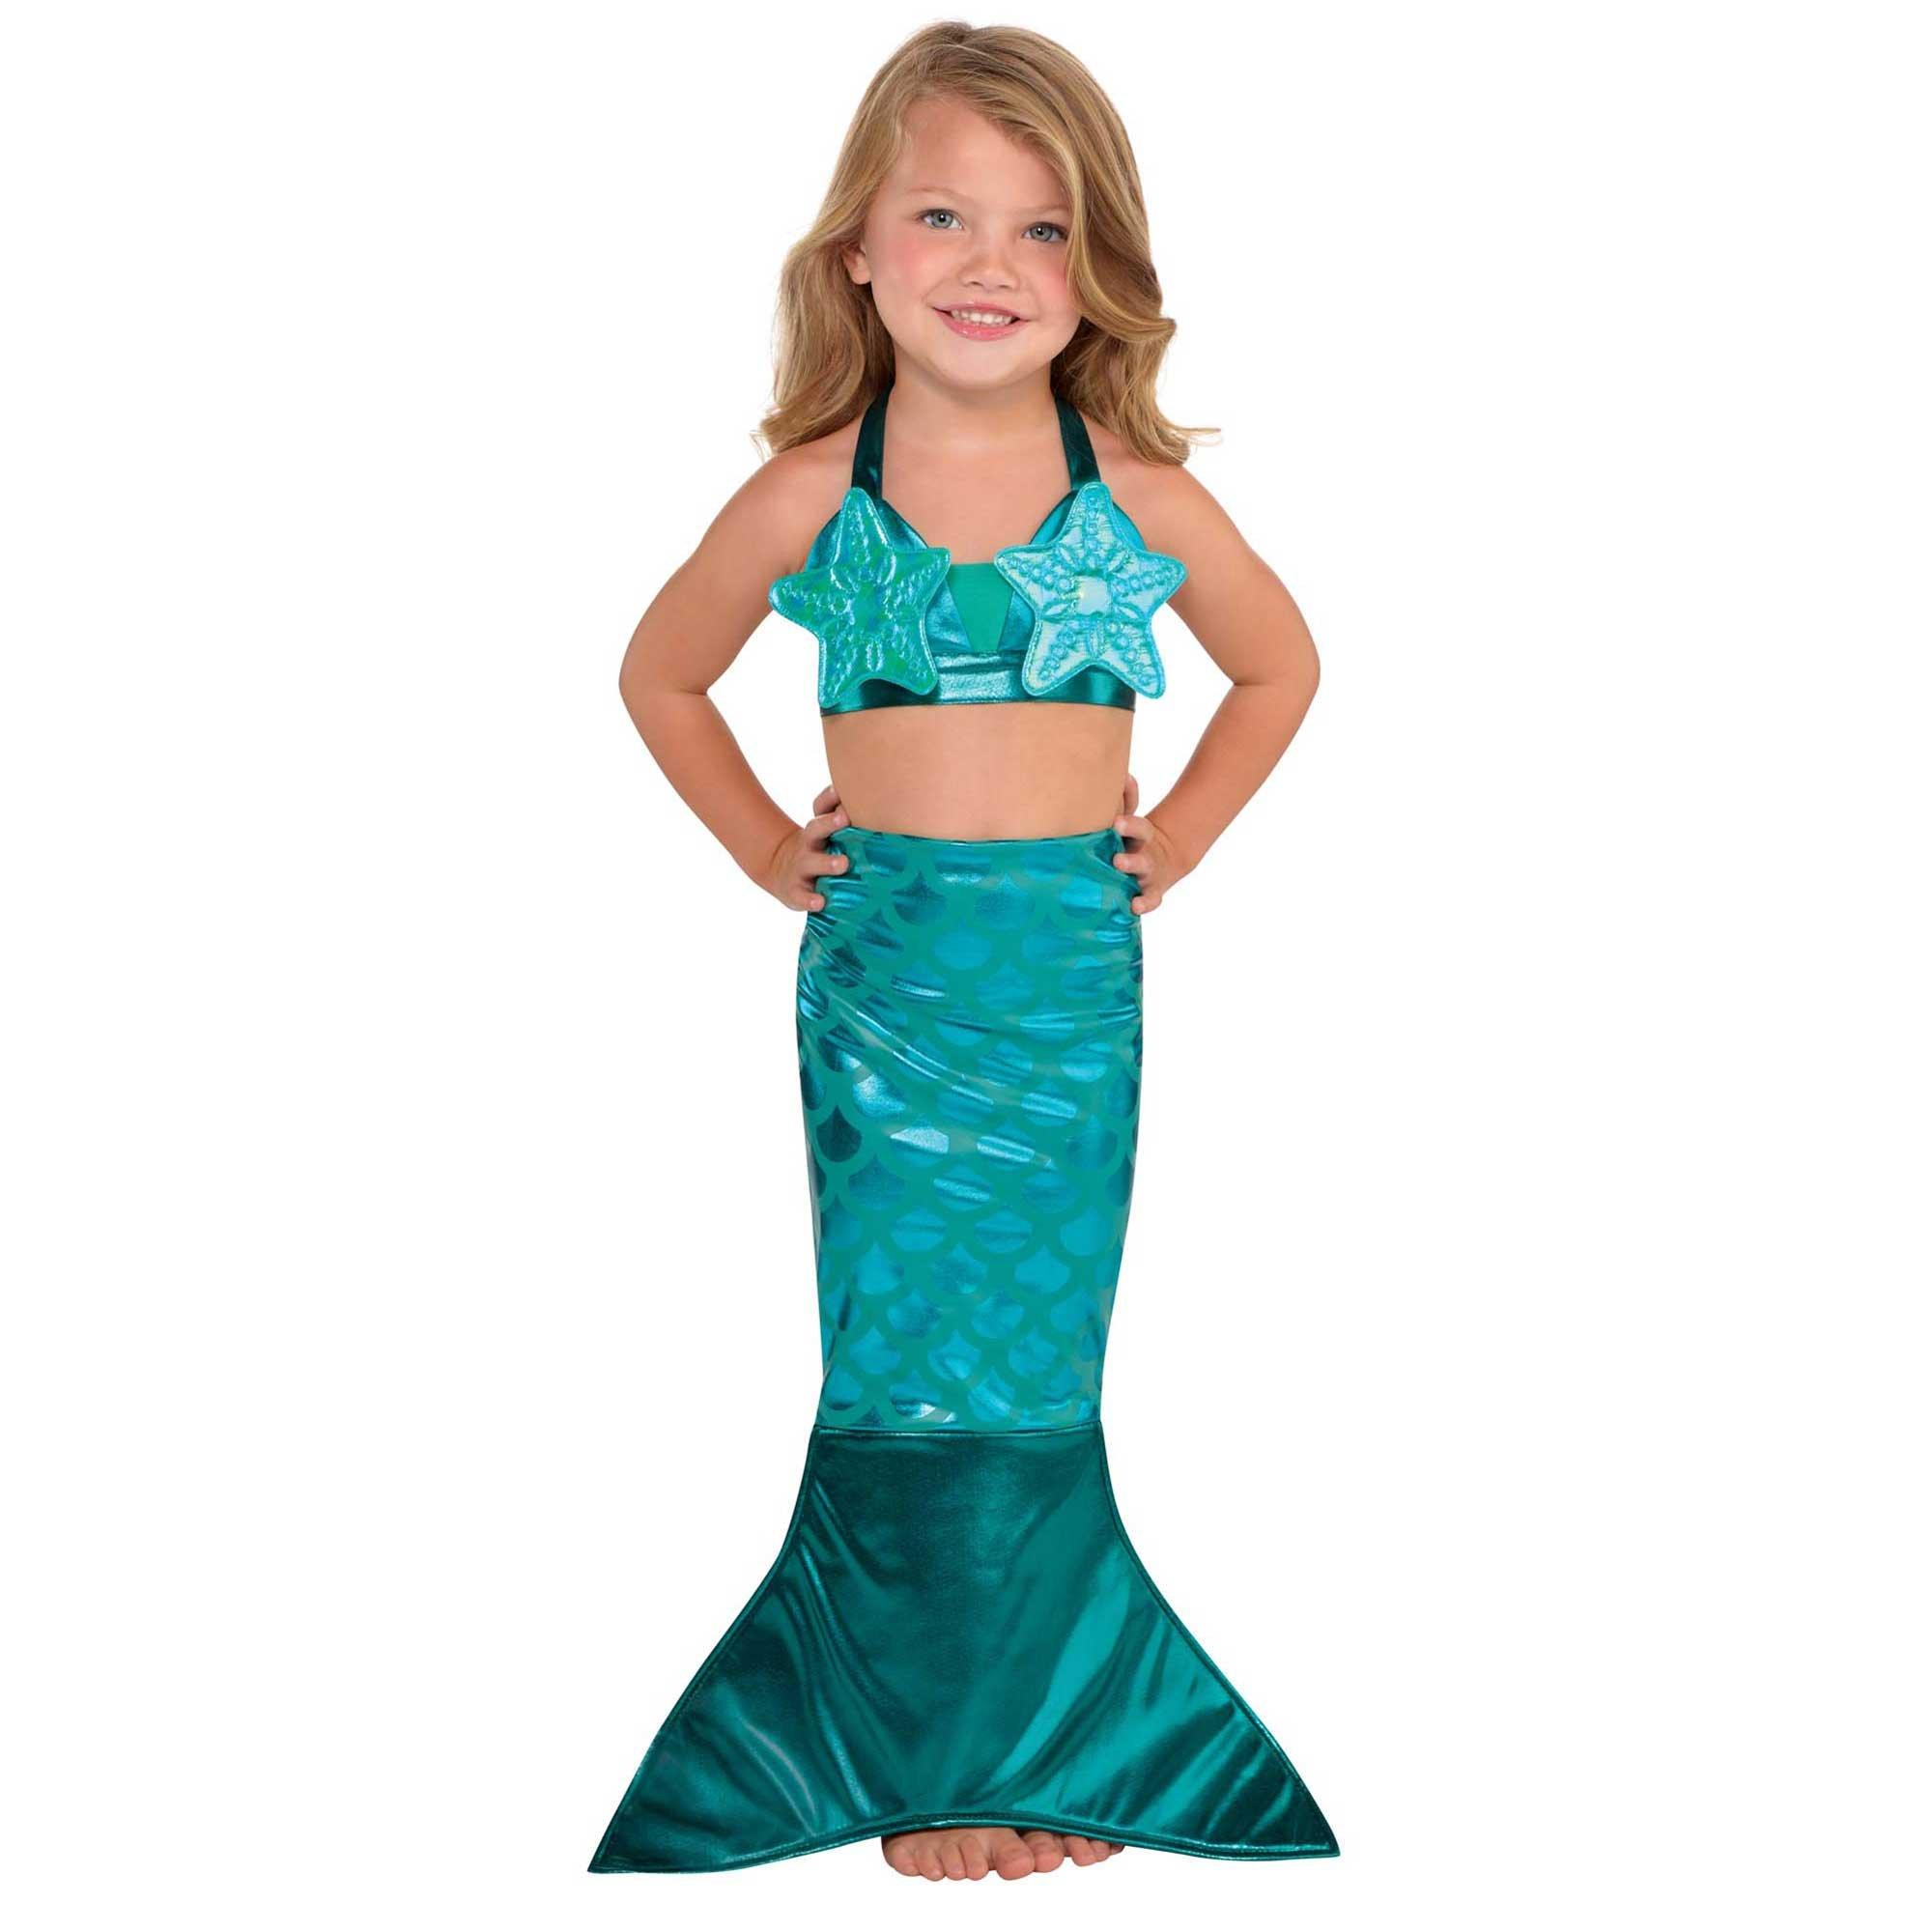 Mermaid Teal Costume Kit Girl Small 4-6 Years